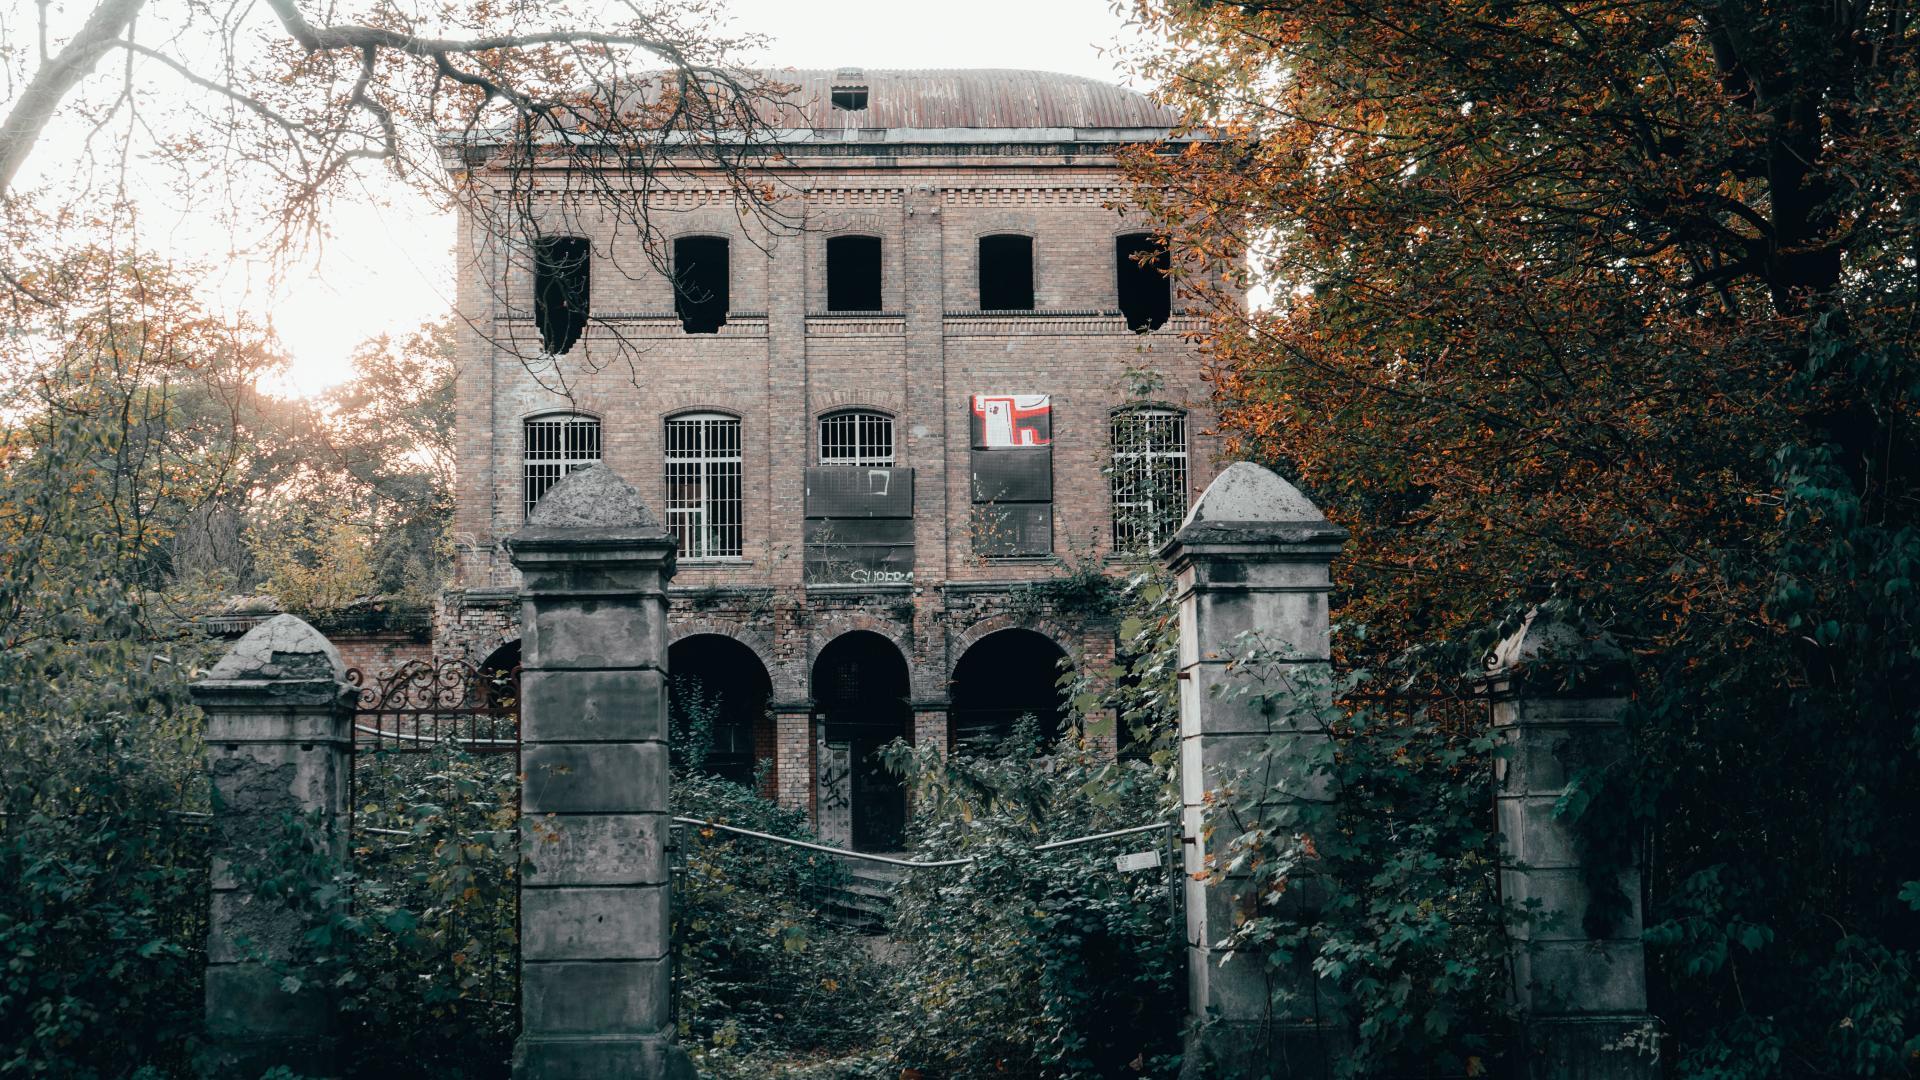 Haus Fühlingen in Köln